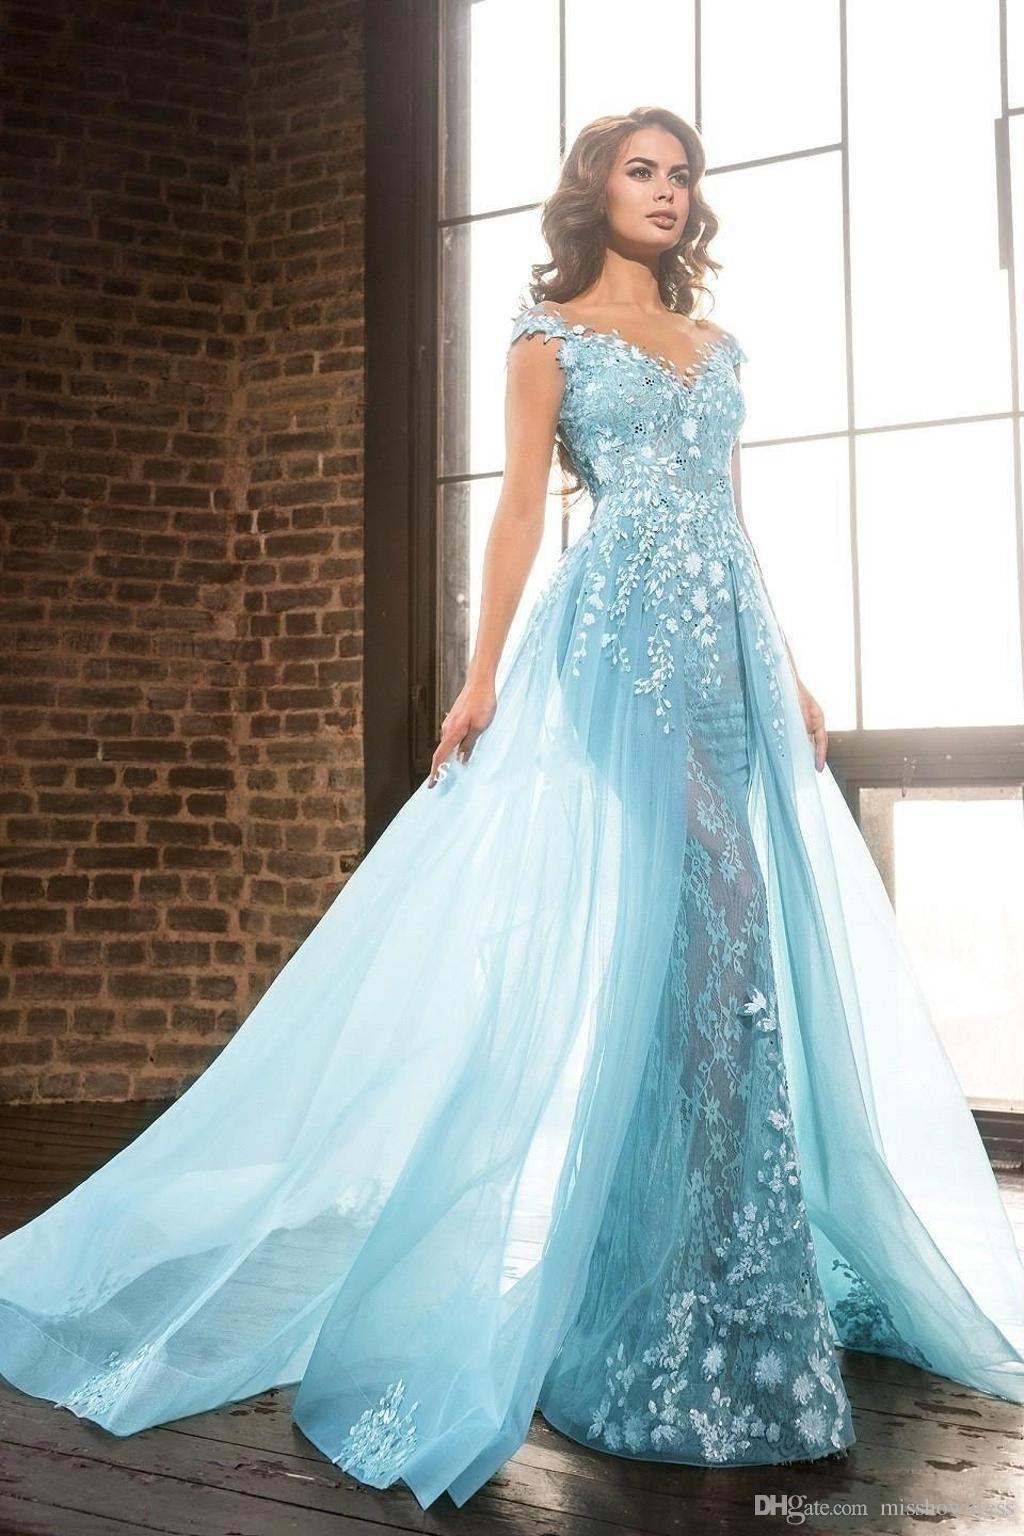 De luxe Bleu clair Sheer Jewel Neck robes de soirée A-Line Dentelle Appliques Perles Overskirts Pageant Robes De Soirée Robes De Festa